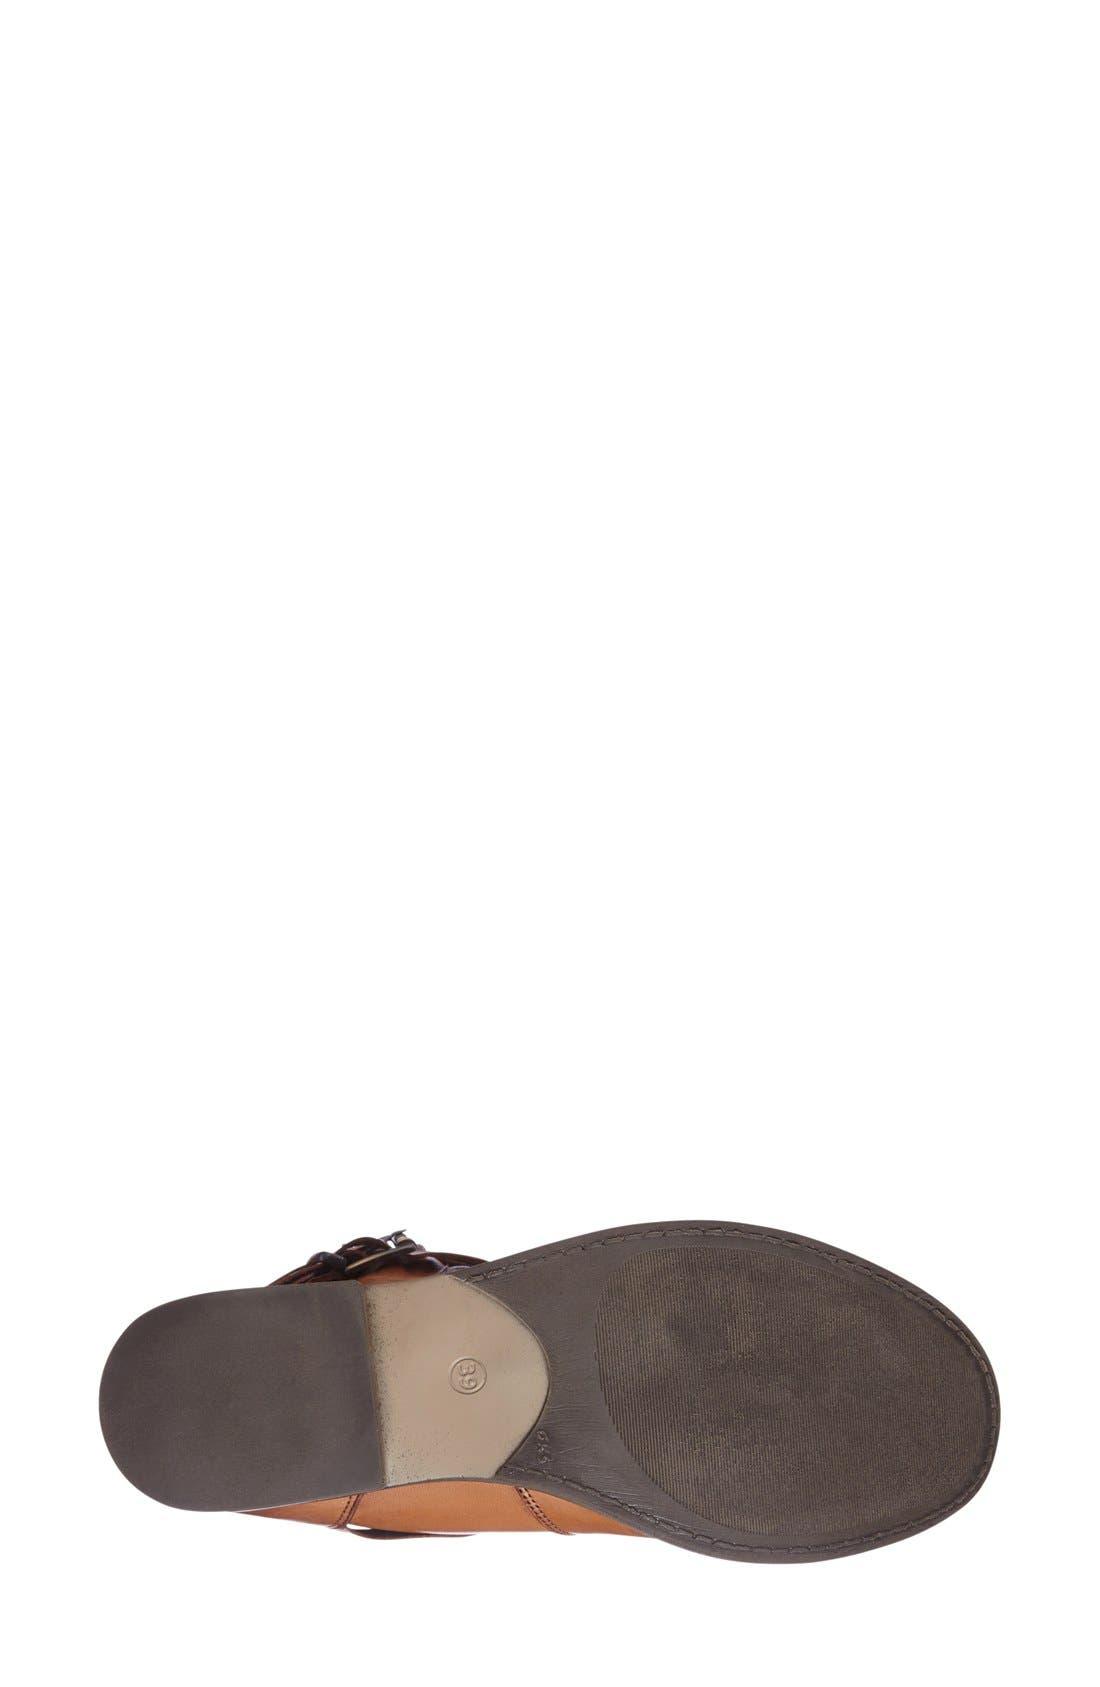 Alternate Image 4  - Miz Mooz 'Clang' Leather Moto Bootie (Women)